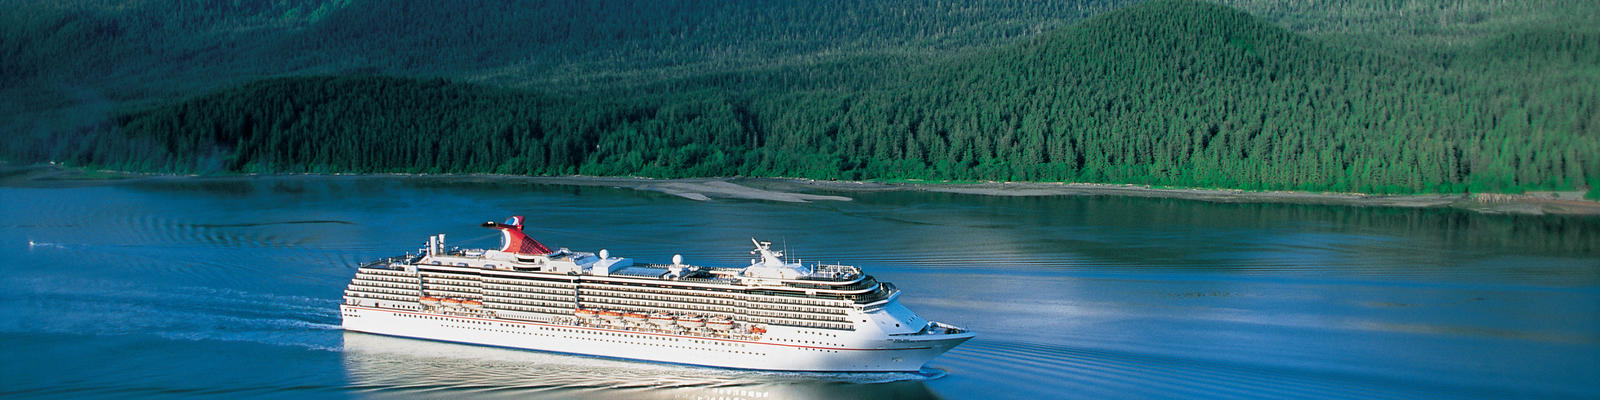 Cruise Critic Q&A with Captain Vittorio Marchi, Captain of Carnival Spirit (Photo: Carnival Cruise Line)